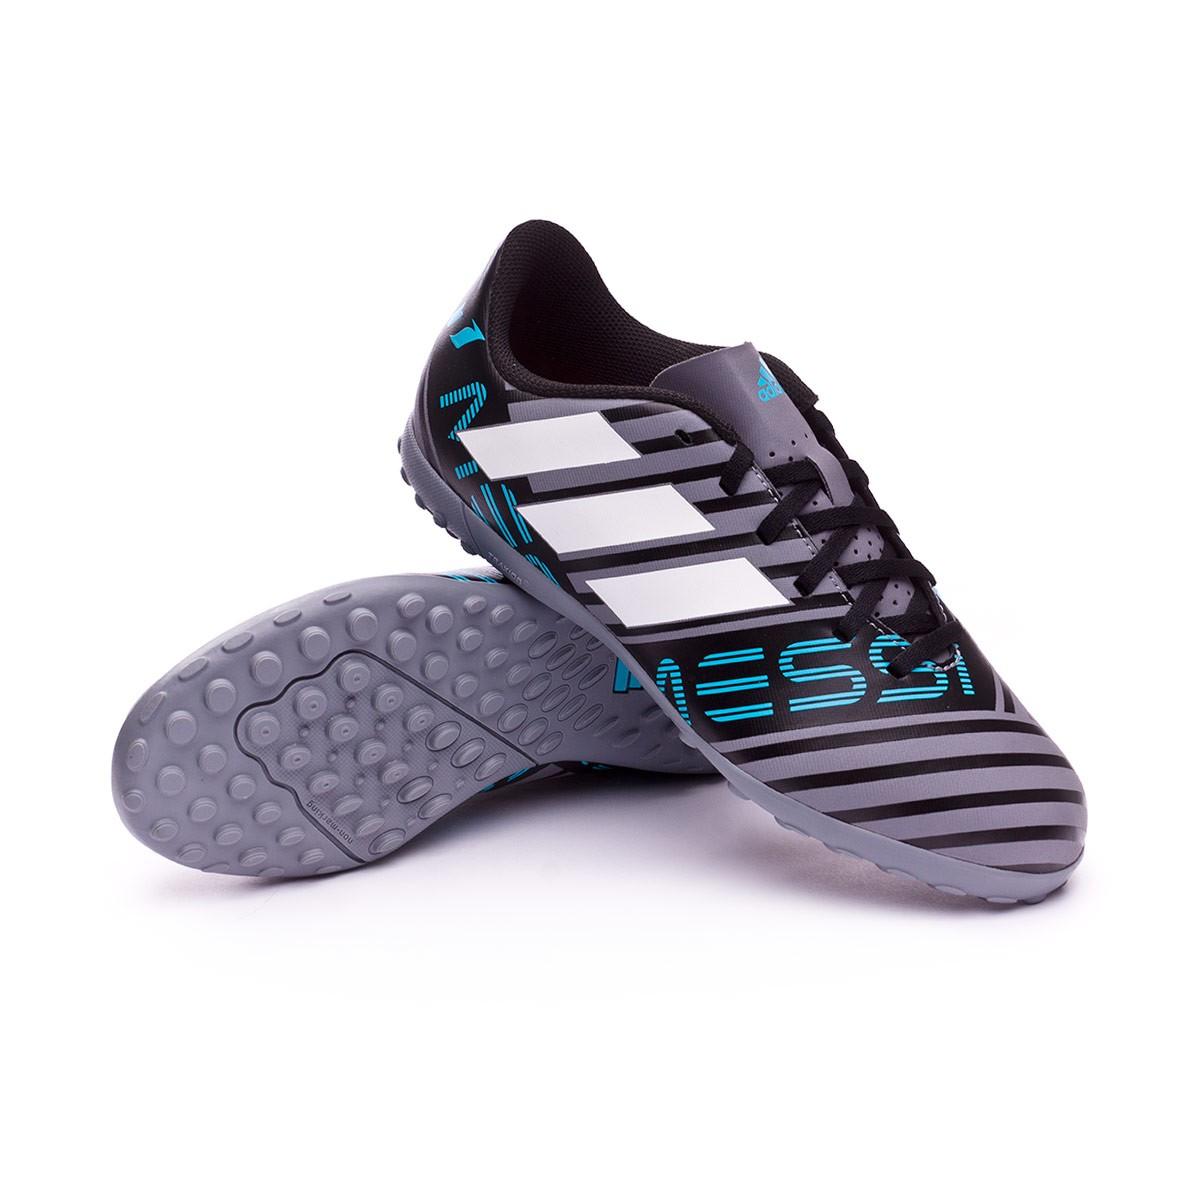 8941cce35 Football Boot adidas Kids Nemeziz Messi Tango 17.4 Turf Grey-White ...